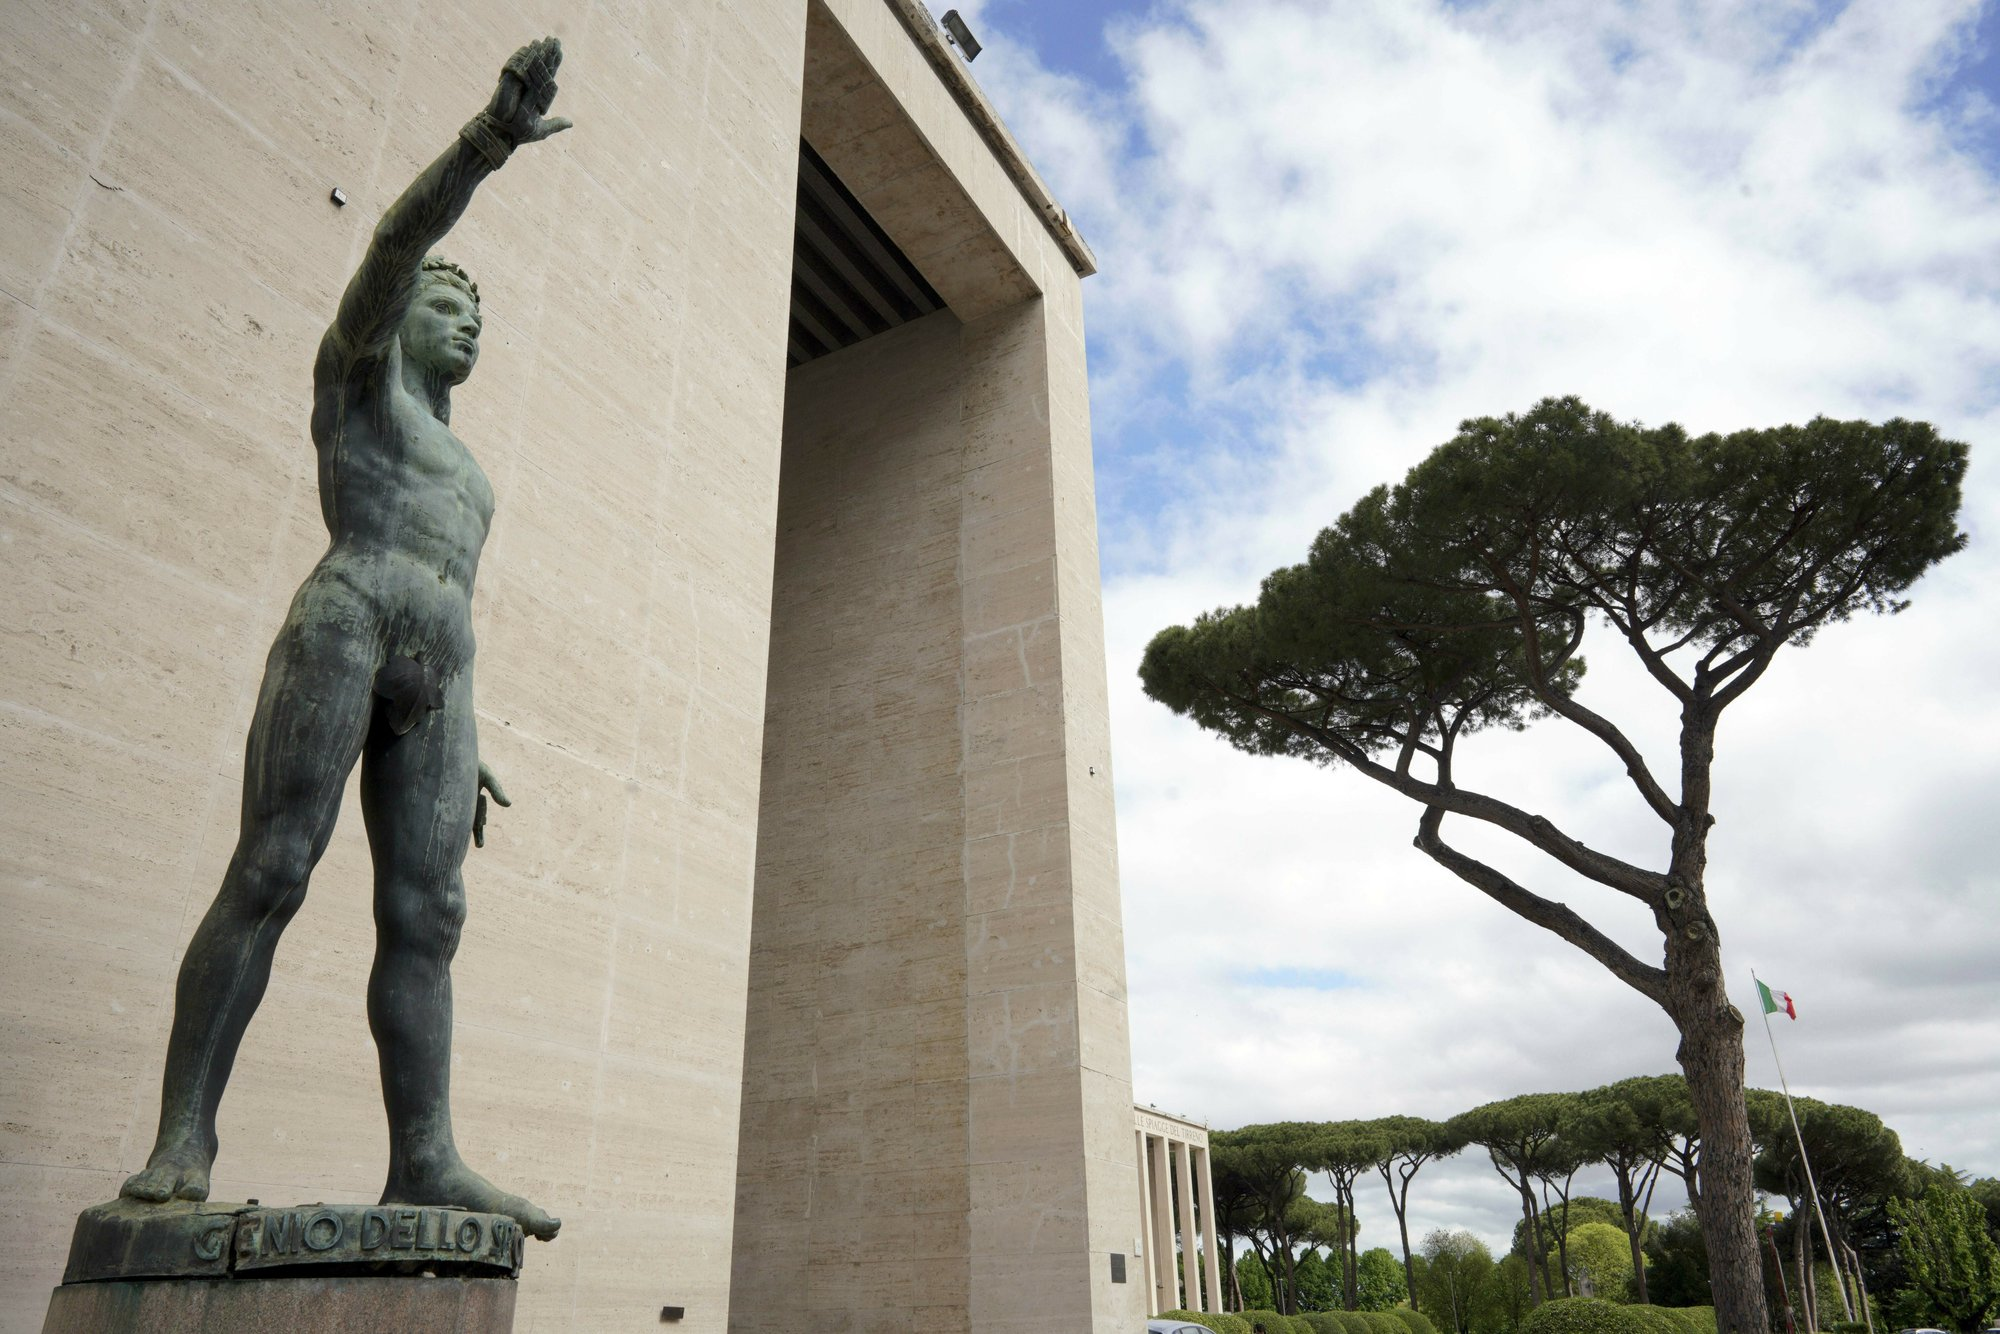 AP PHOTOS: Fascist legacy endures in Rome's architecture